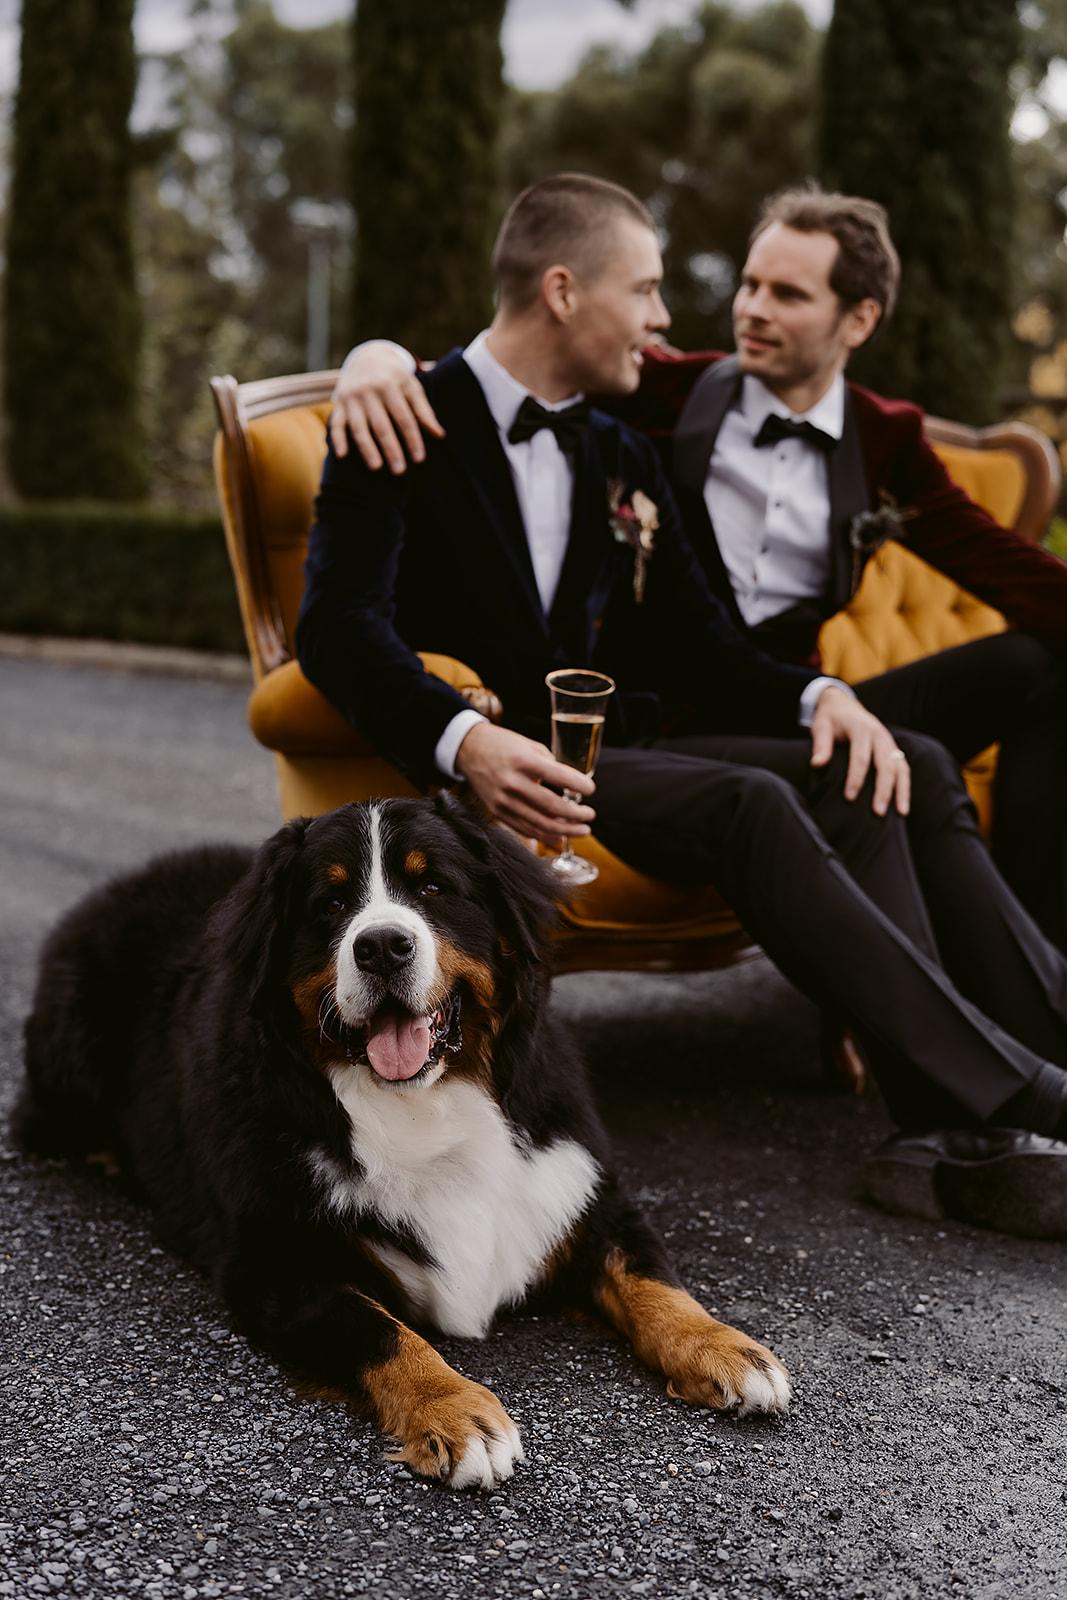 Immerse_Yarra_Valley_Same_Sex_Wedding_-_Ashleigh_Haase_Photography-68.jpg